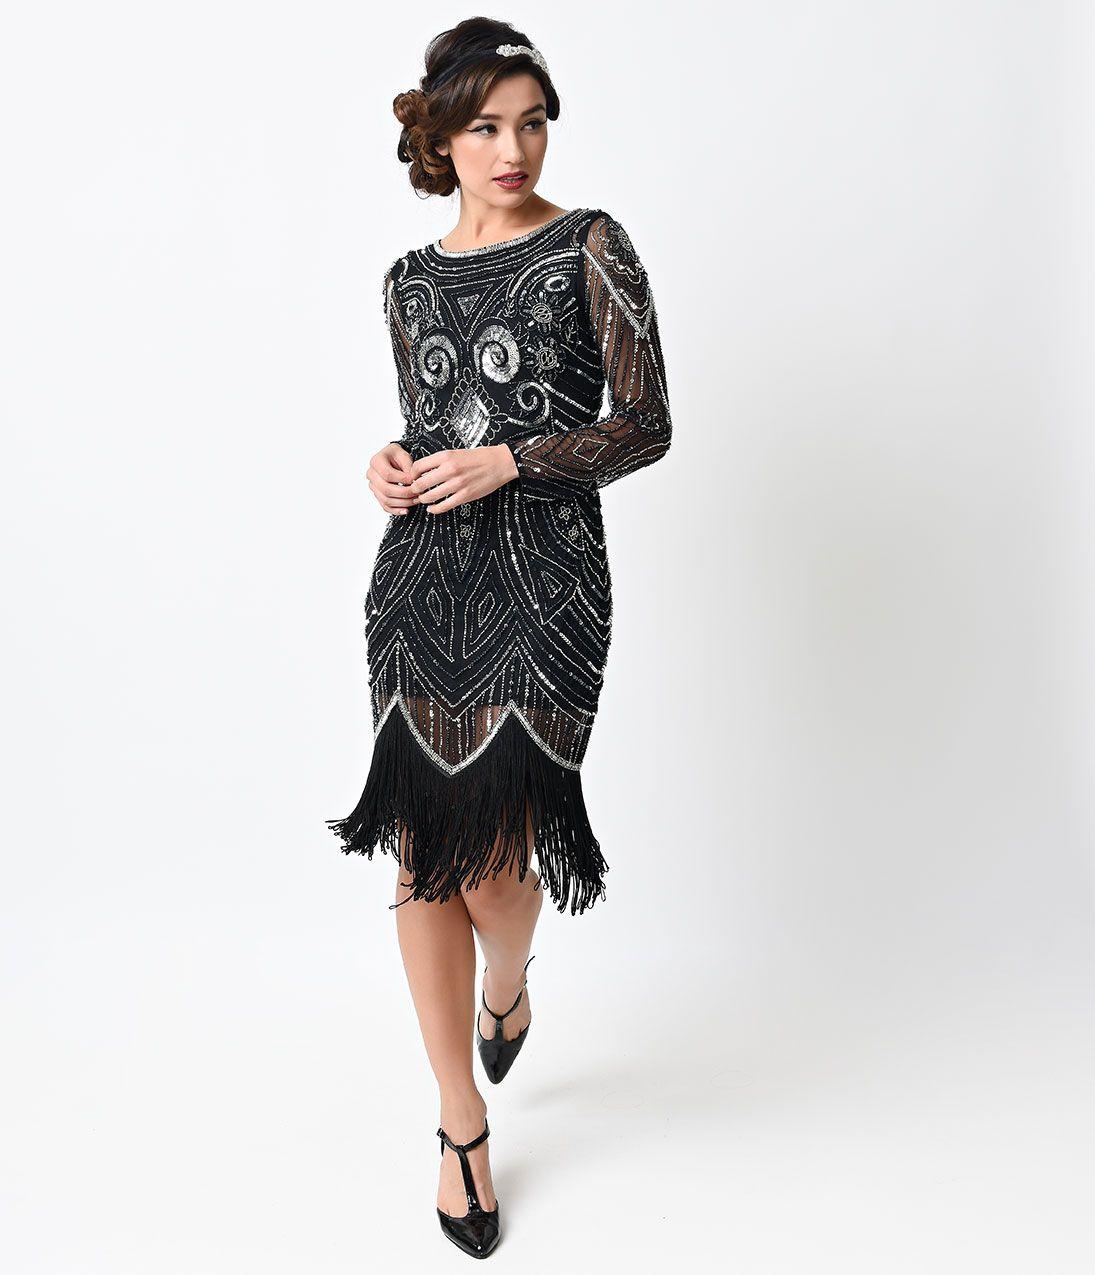 1920s Style Cocktail Party Dresses 1920s Fashion 1920s Evening Dress Flapper Dress [ 1275 x 1095 Pixel ]